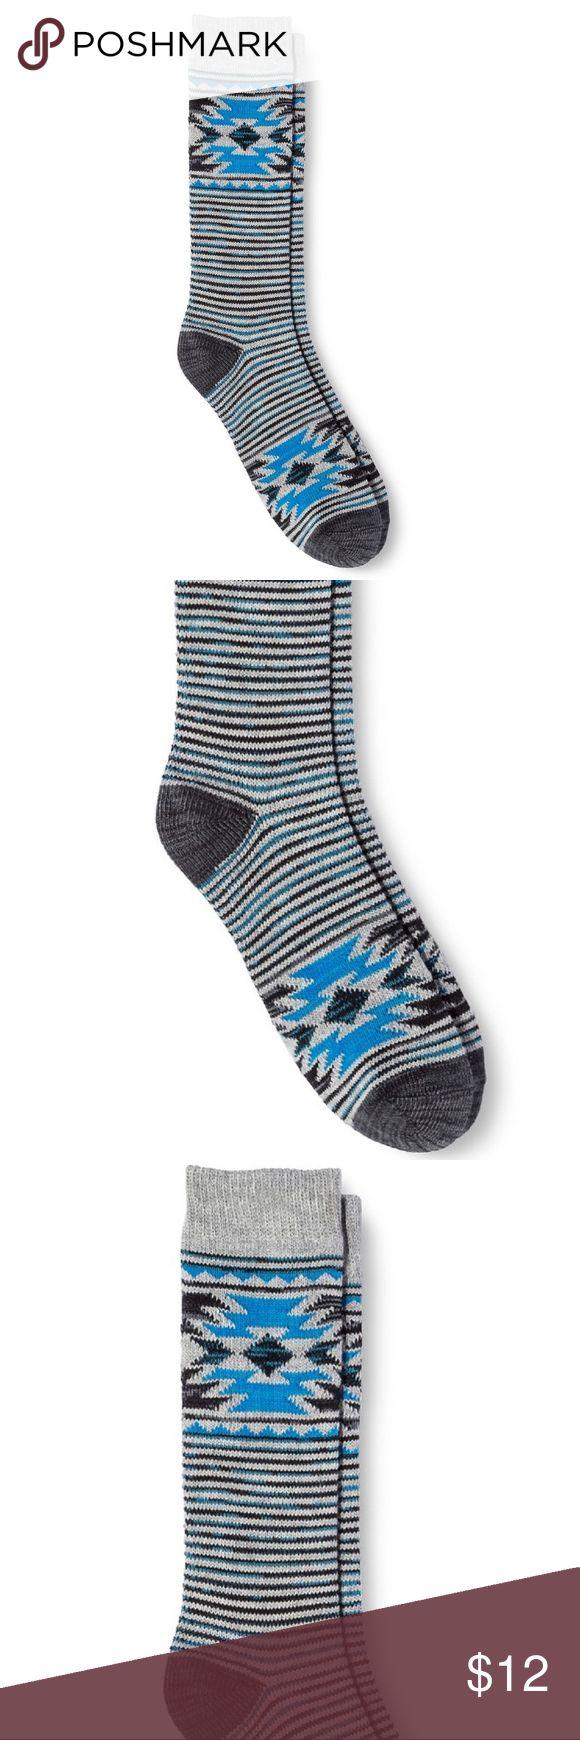 Mens Hiking Socks 6 12 Mossimo Geo Stripes Mens Hiking Socks 6 12 Mossimo Blue Gray Grey Geo Stripes  Mossimo  Hiking Socks   Fits shoe size  6-12   This item is new! Mossimo Supply Co. Underwear & Socks Athletic Socks #hikingsupplies